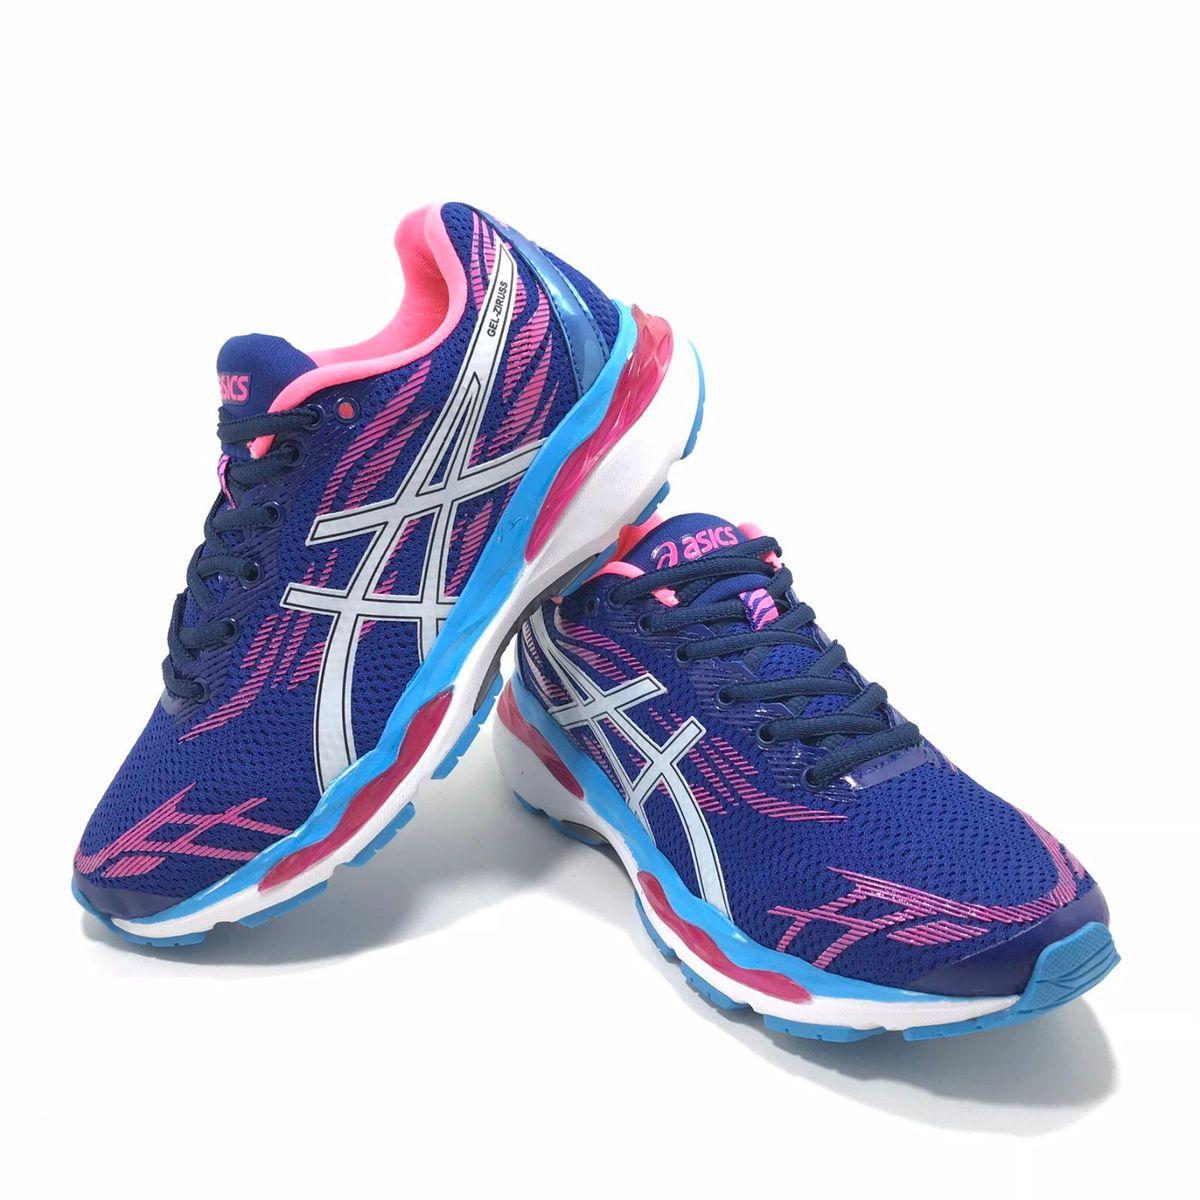 9f561416aa8 Tênis Asics Gel Ziruss Feminino Novo Academia Corrida Fitness ...